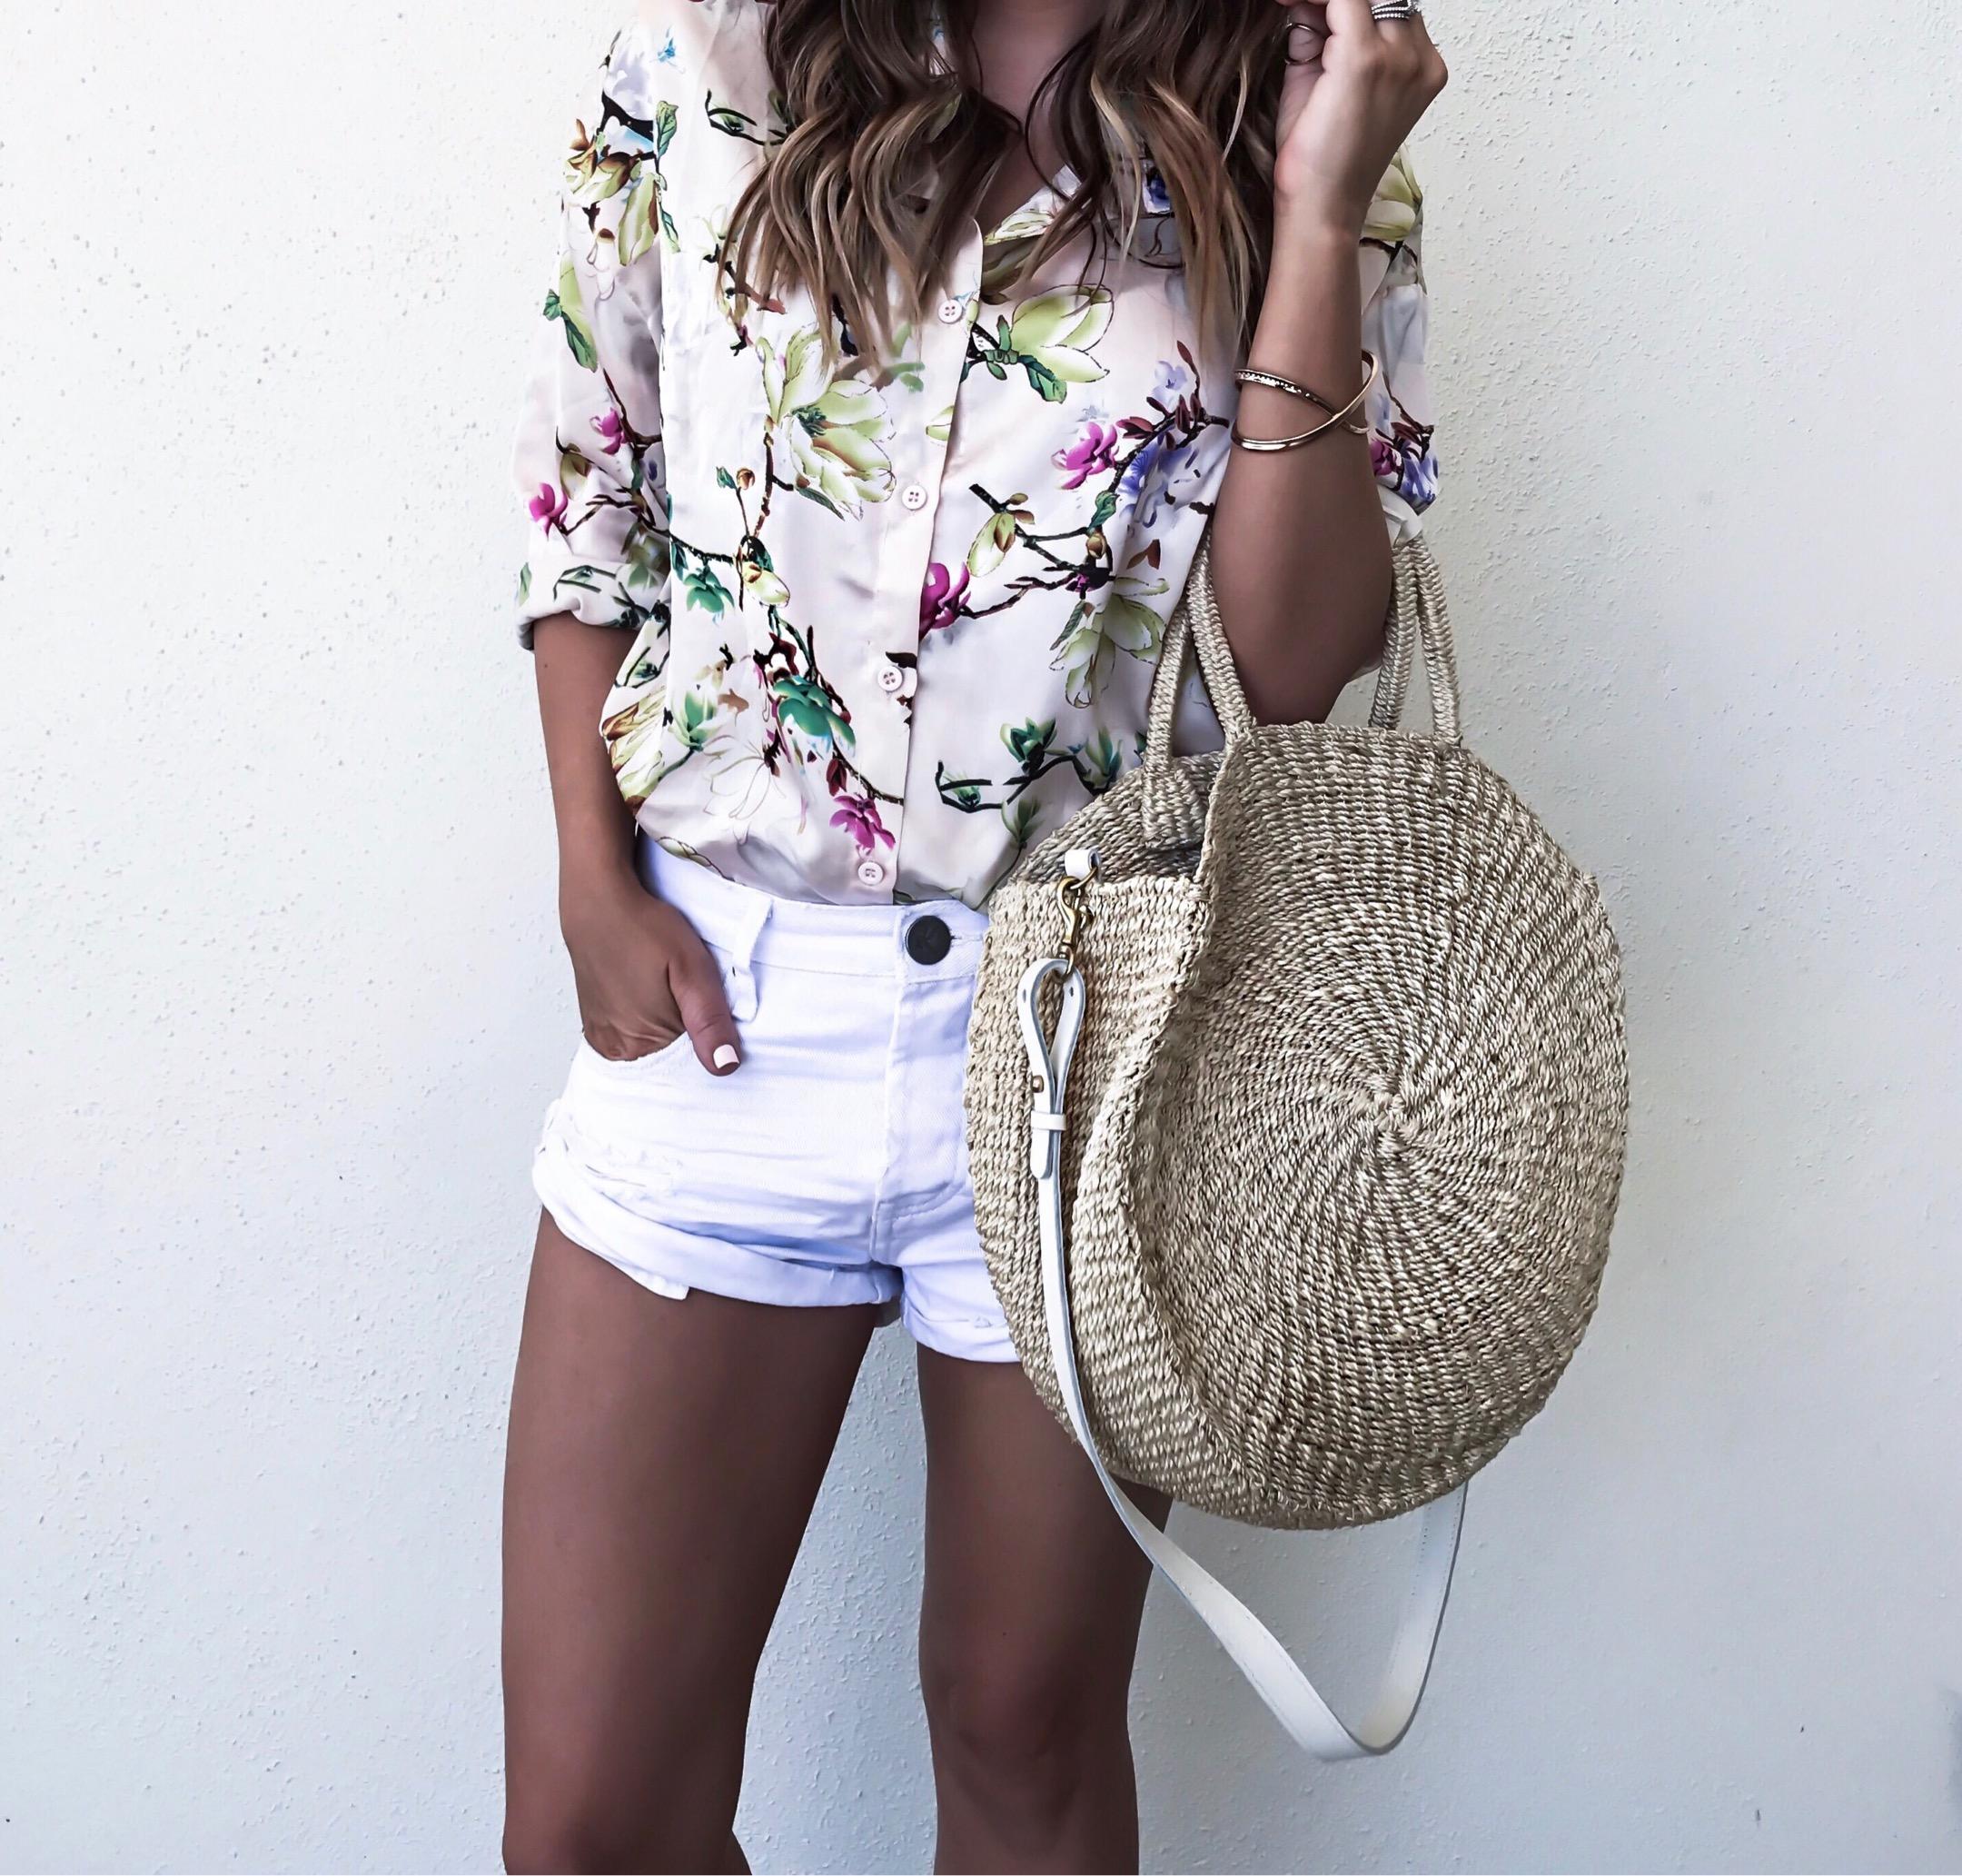 Tiffany Jais Houston fashion and lifestyle blogger | Clare V Alice round tote, one teaspoon bandit shorts